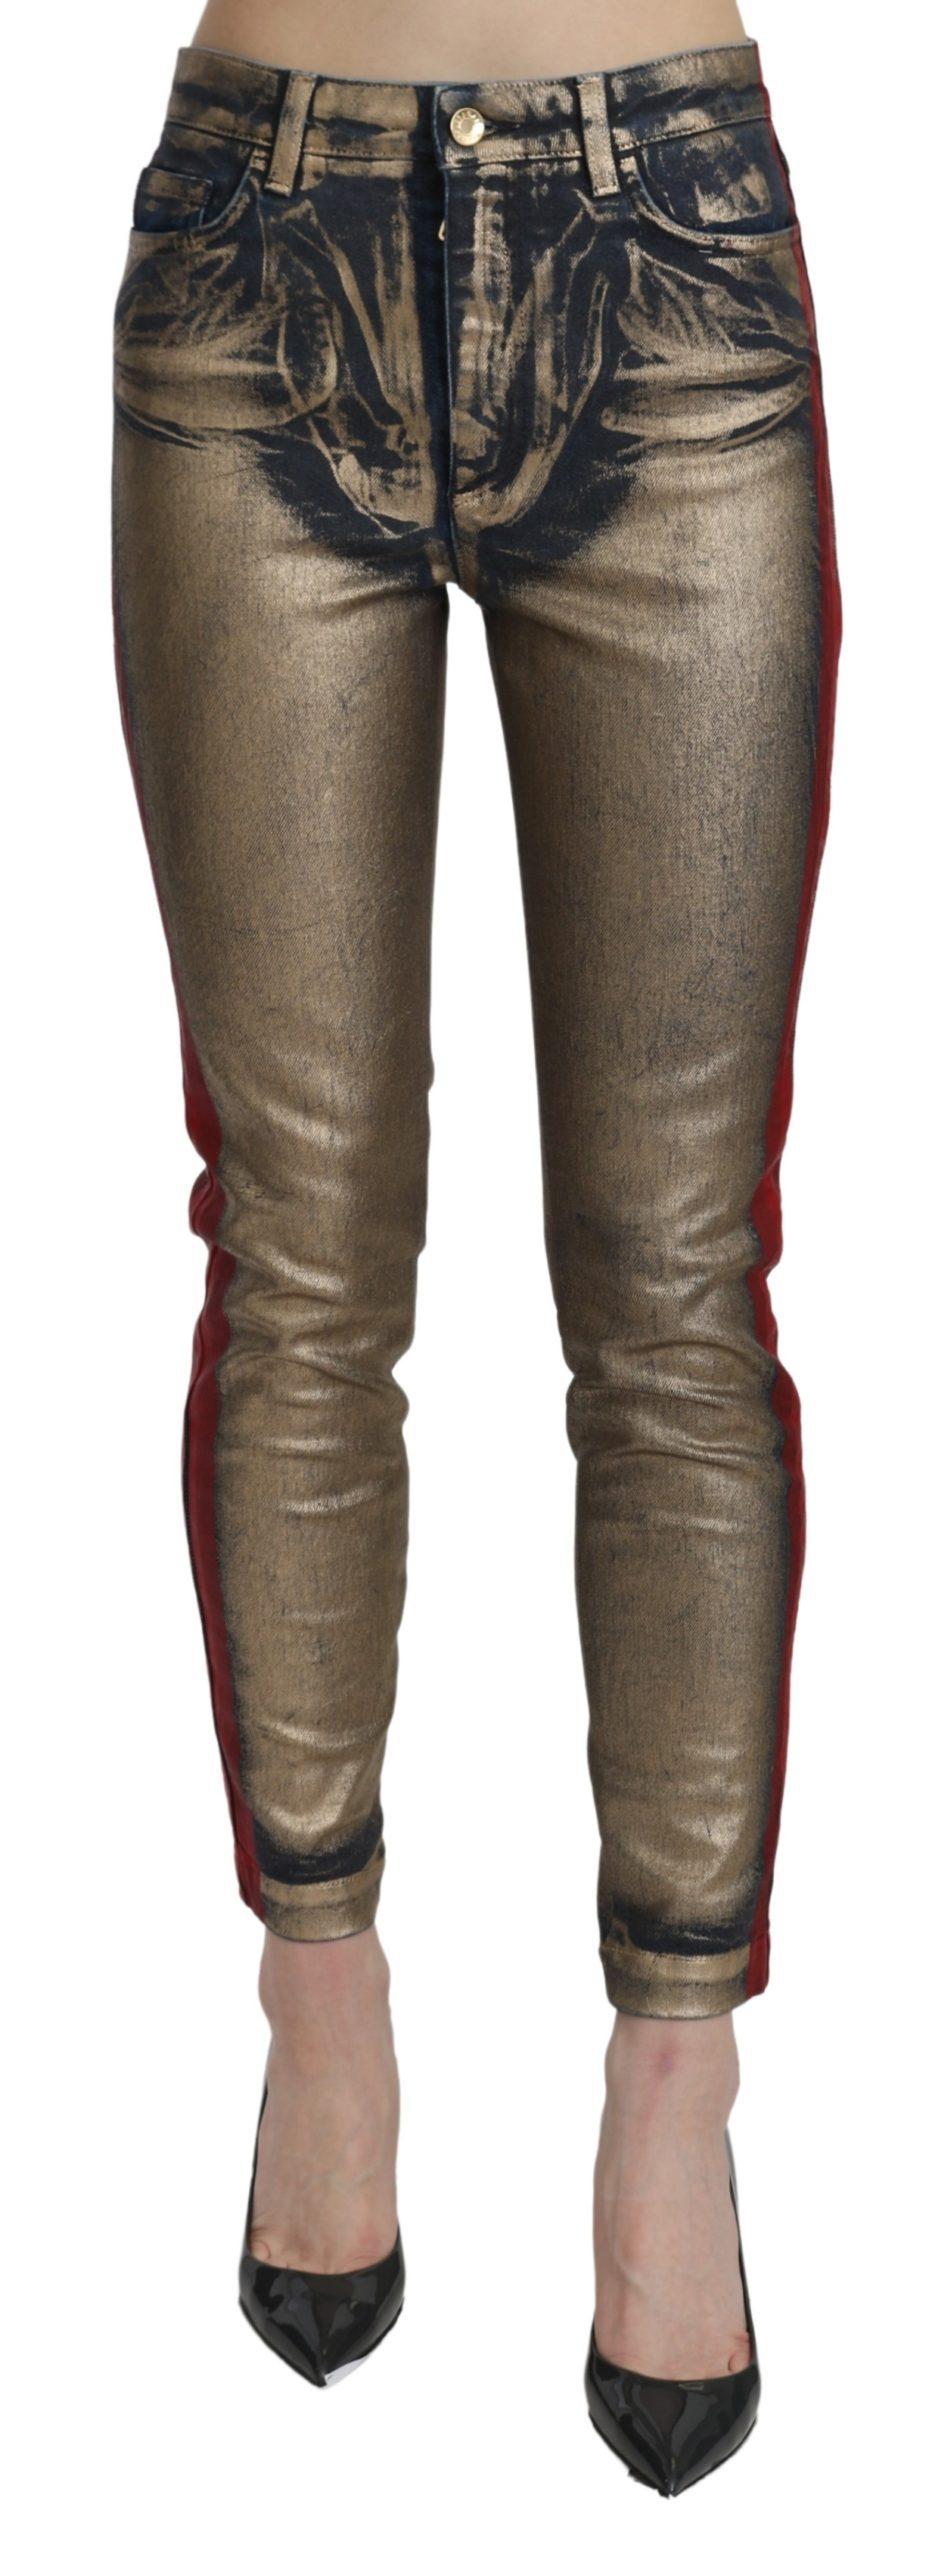 Dolce & Gabbana Women's High Waist Skinny Cotton Trouser Gold PAN71068 - IT40|S